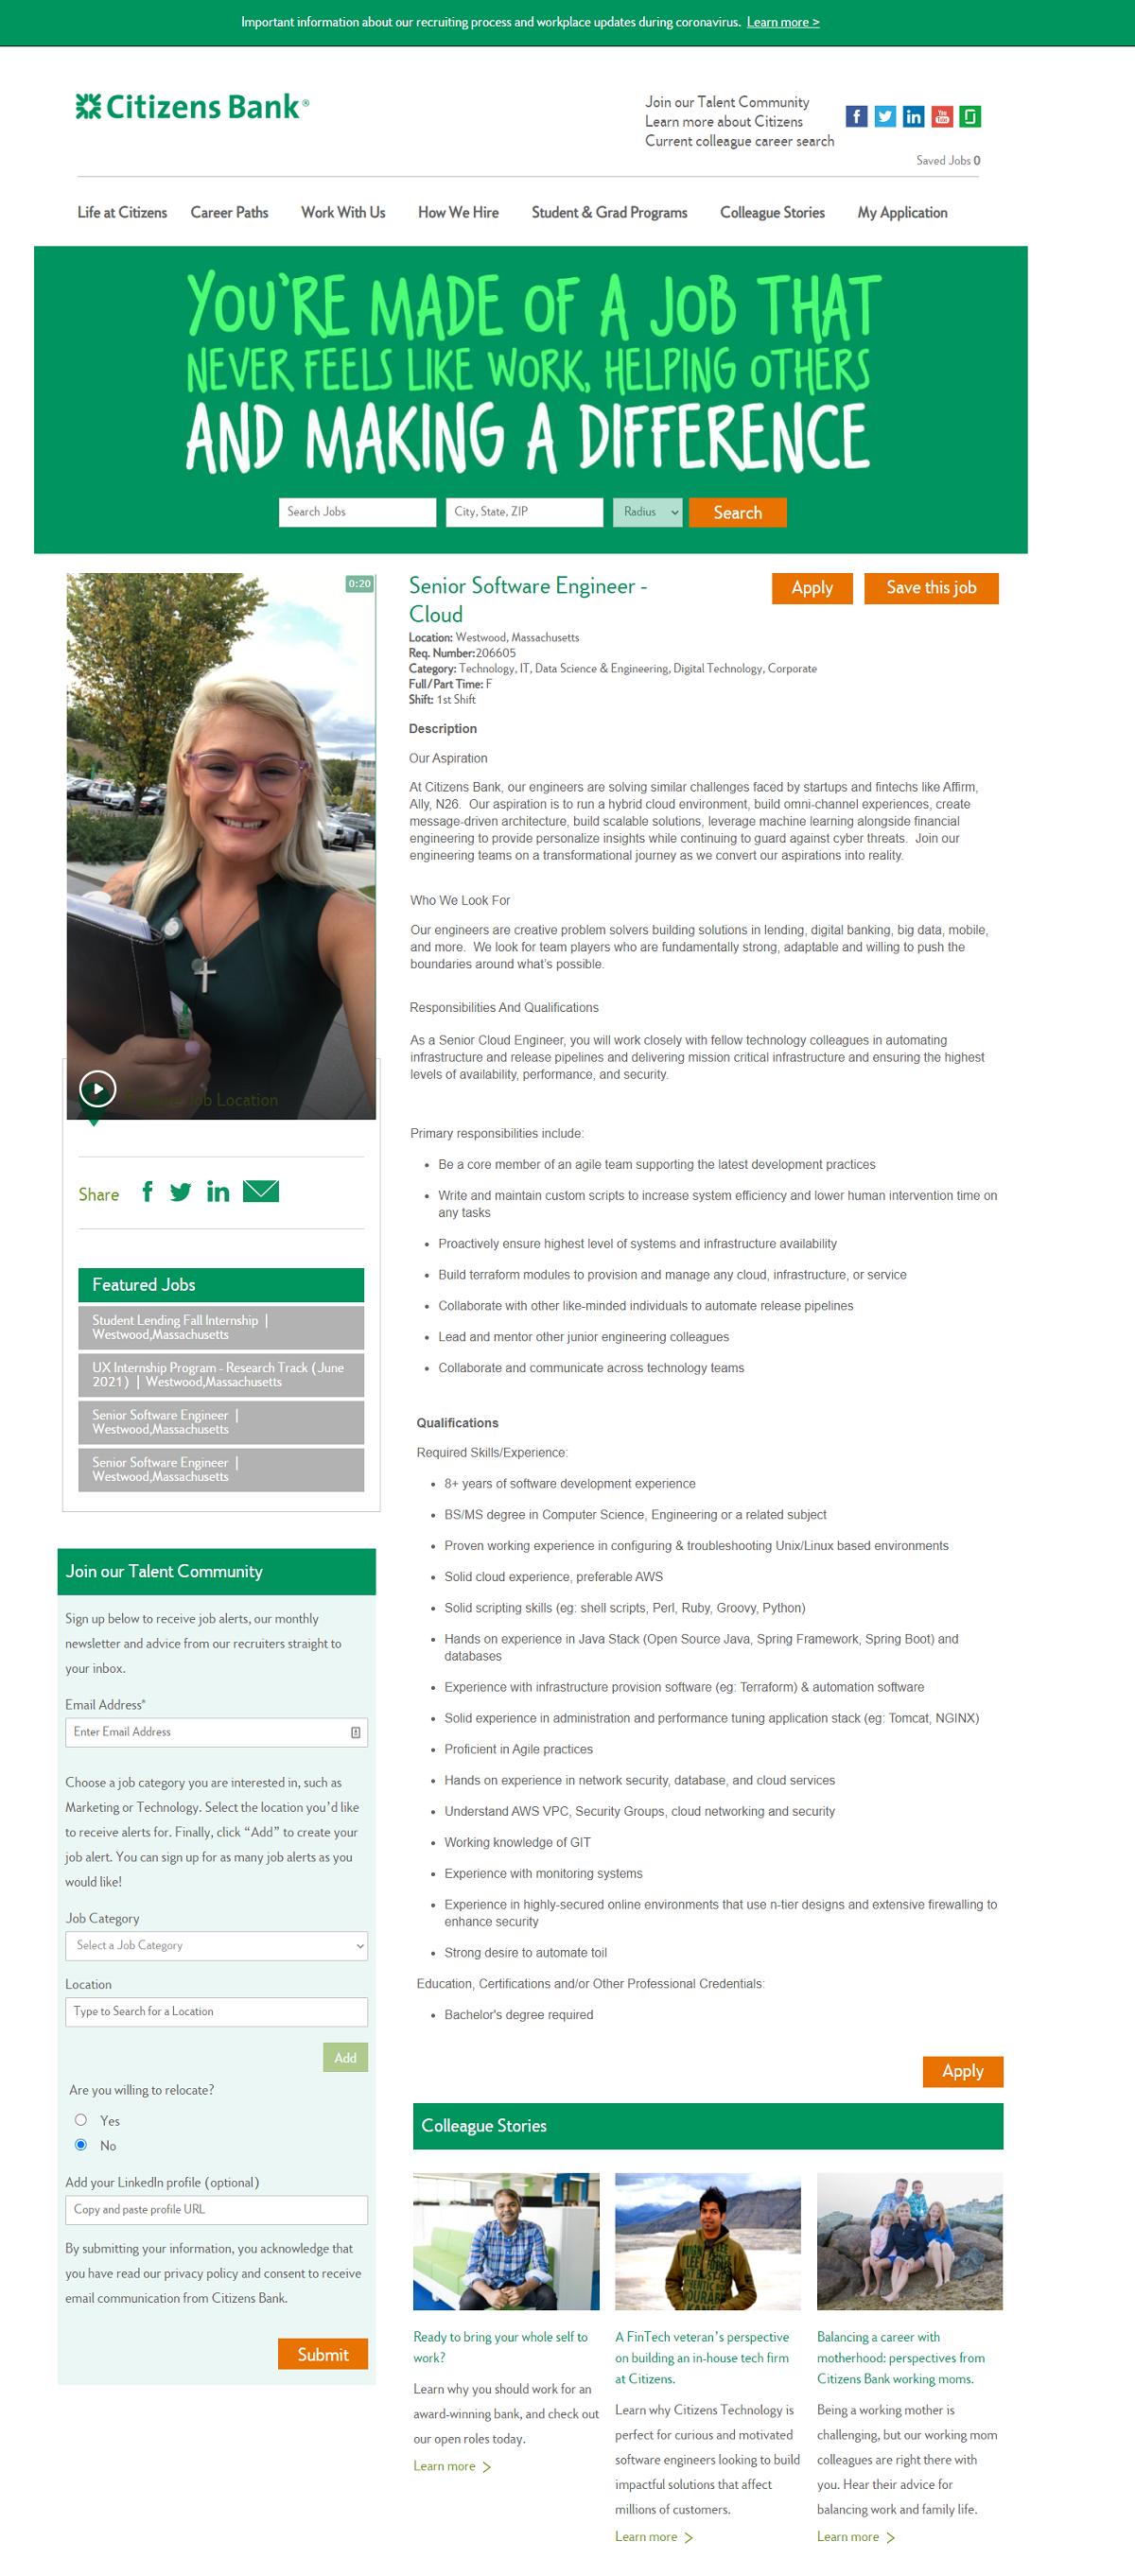 taleo ats job page overlay citizens bank